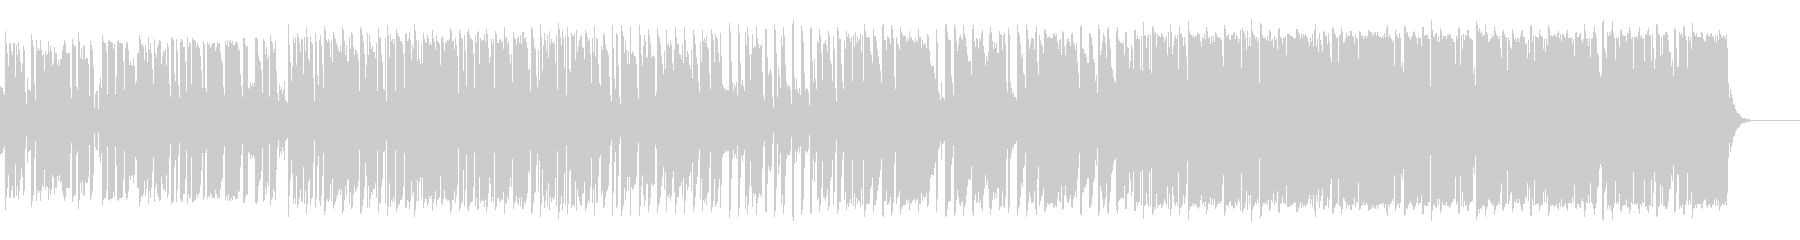 jazz track 01の未再生の波形